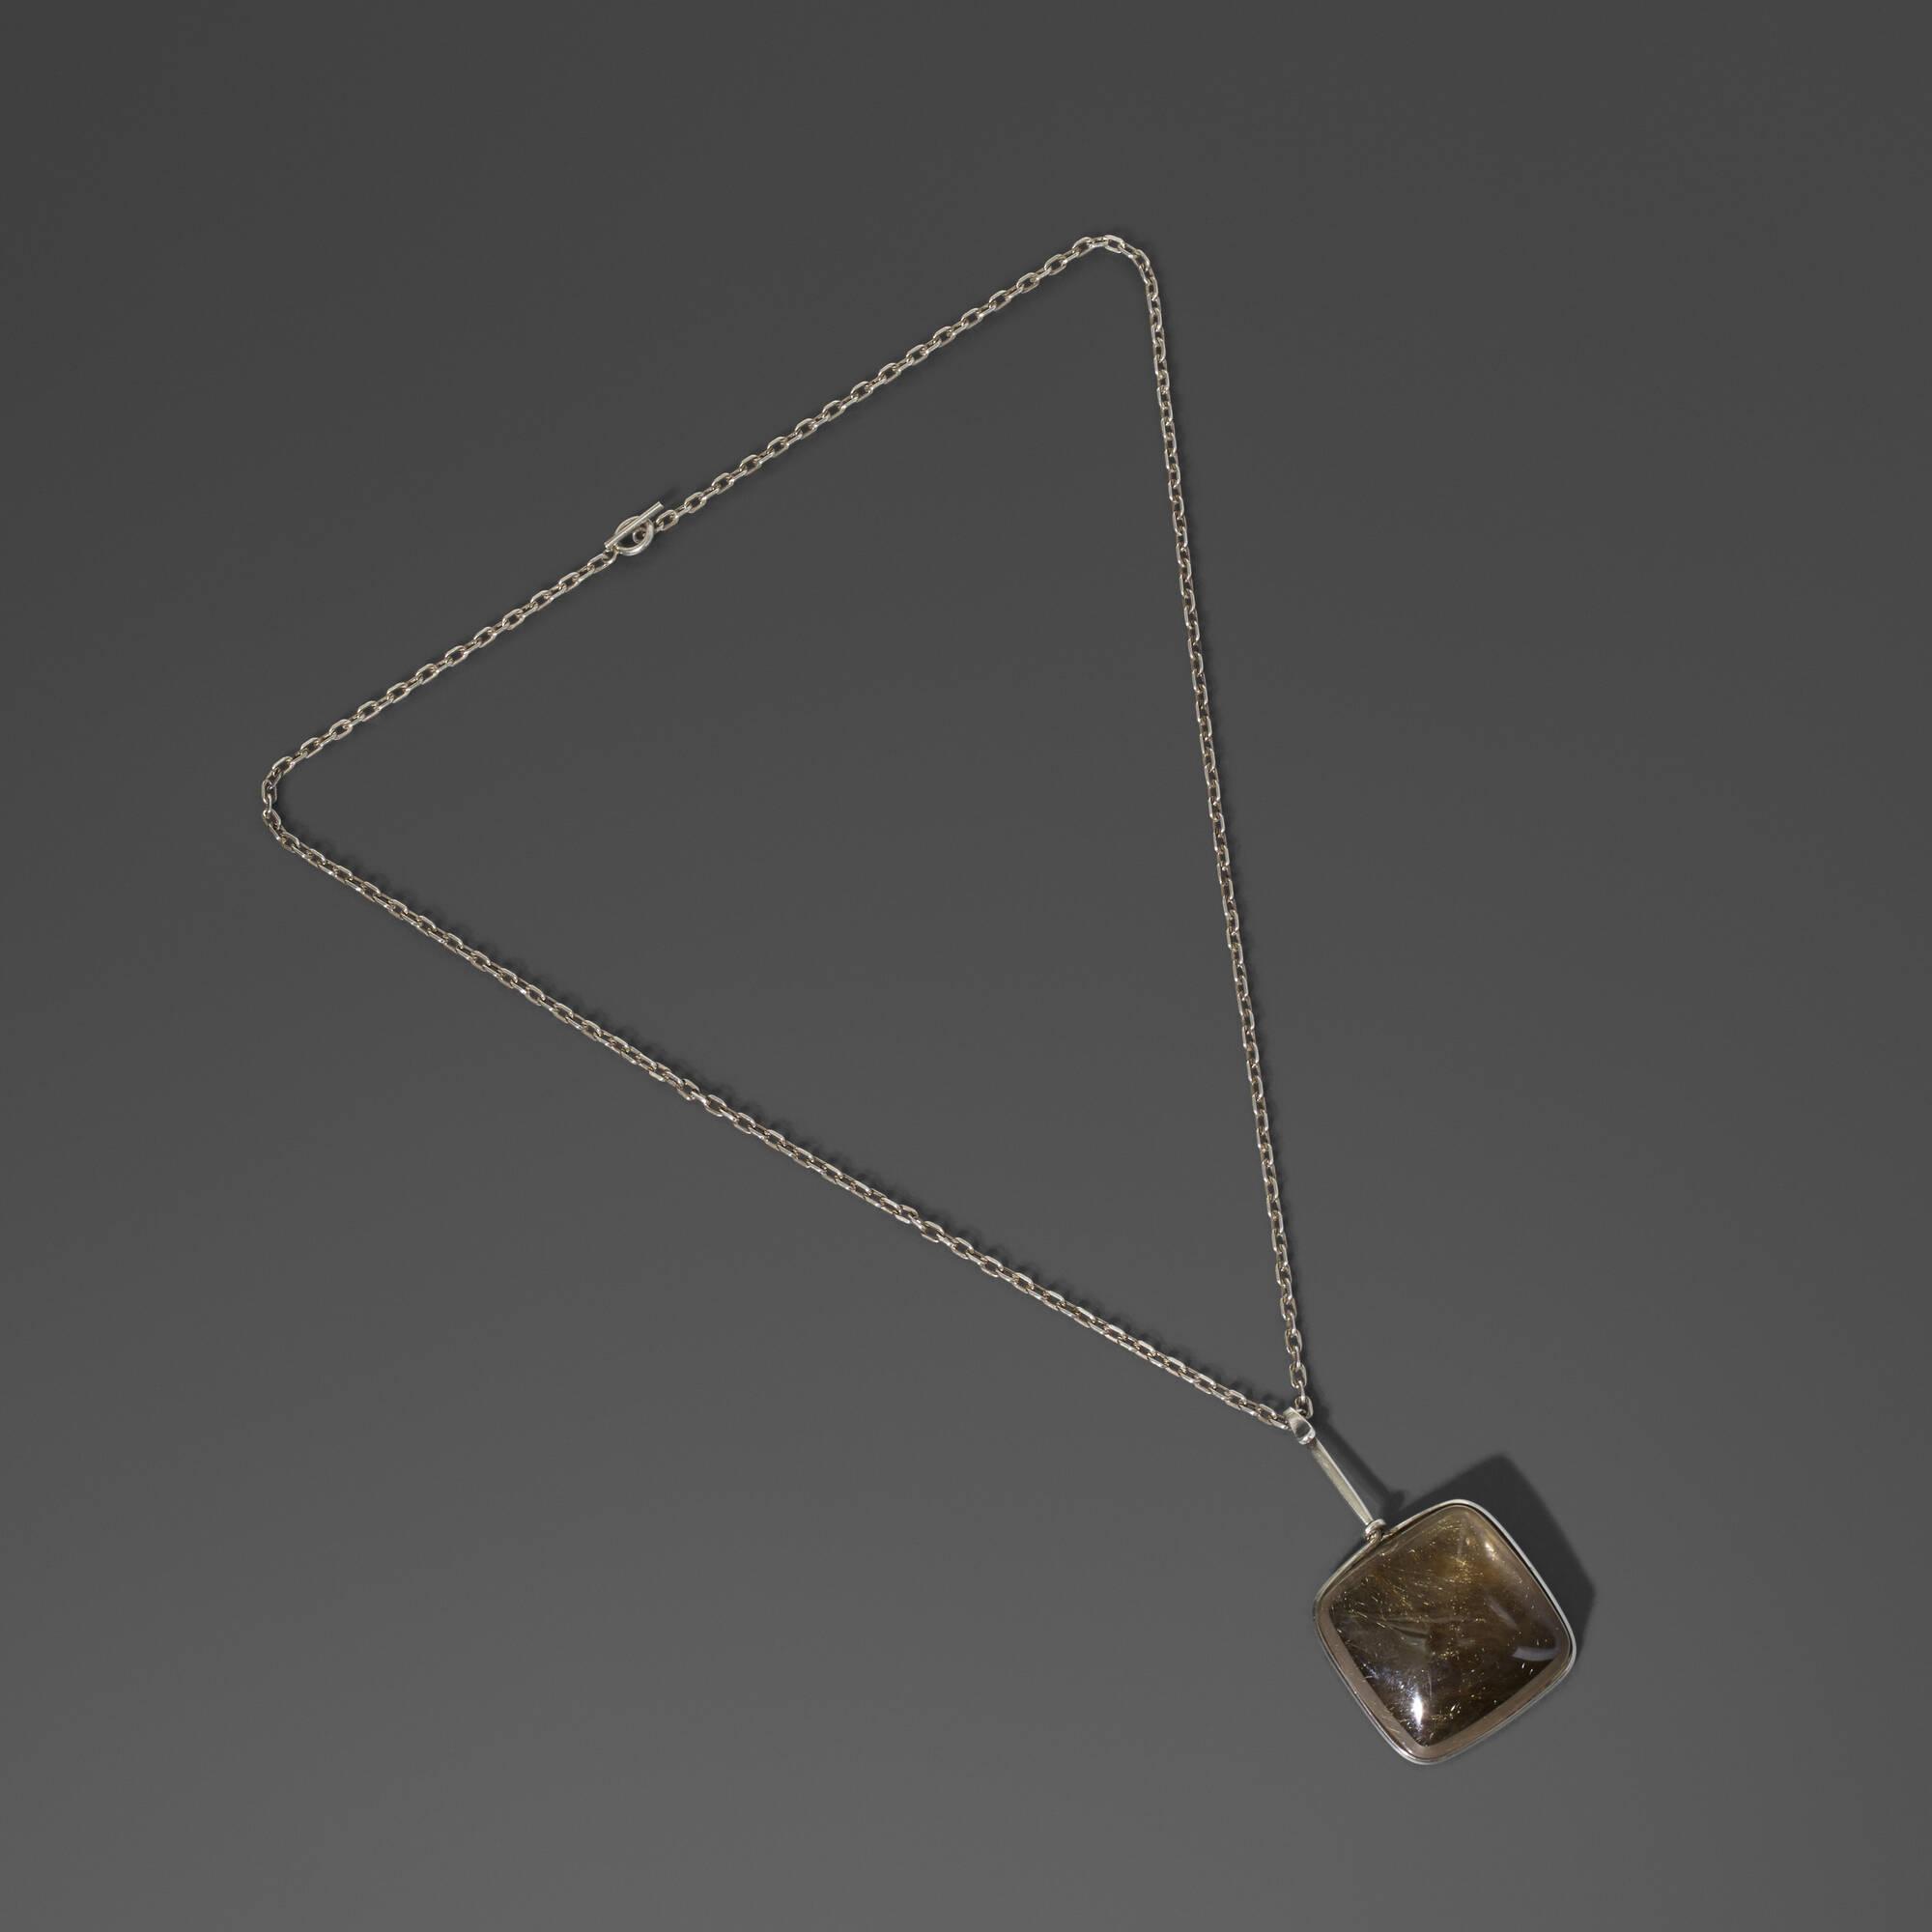 294: Vivianna Torun Bülow-Hübe / necklace (1 of 1)